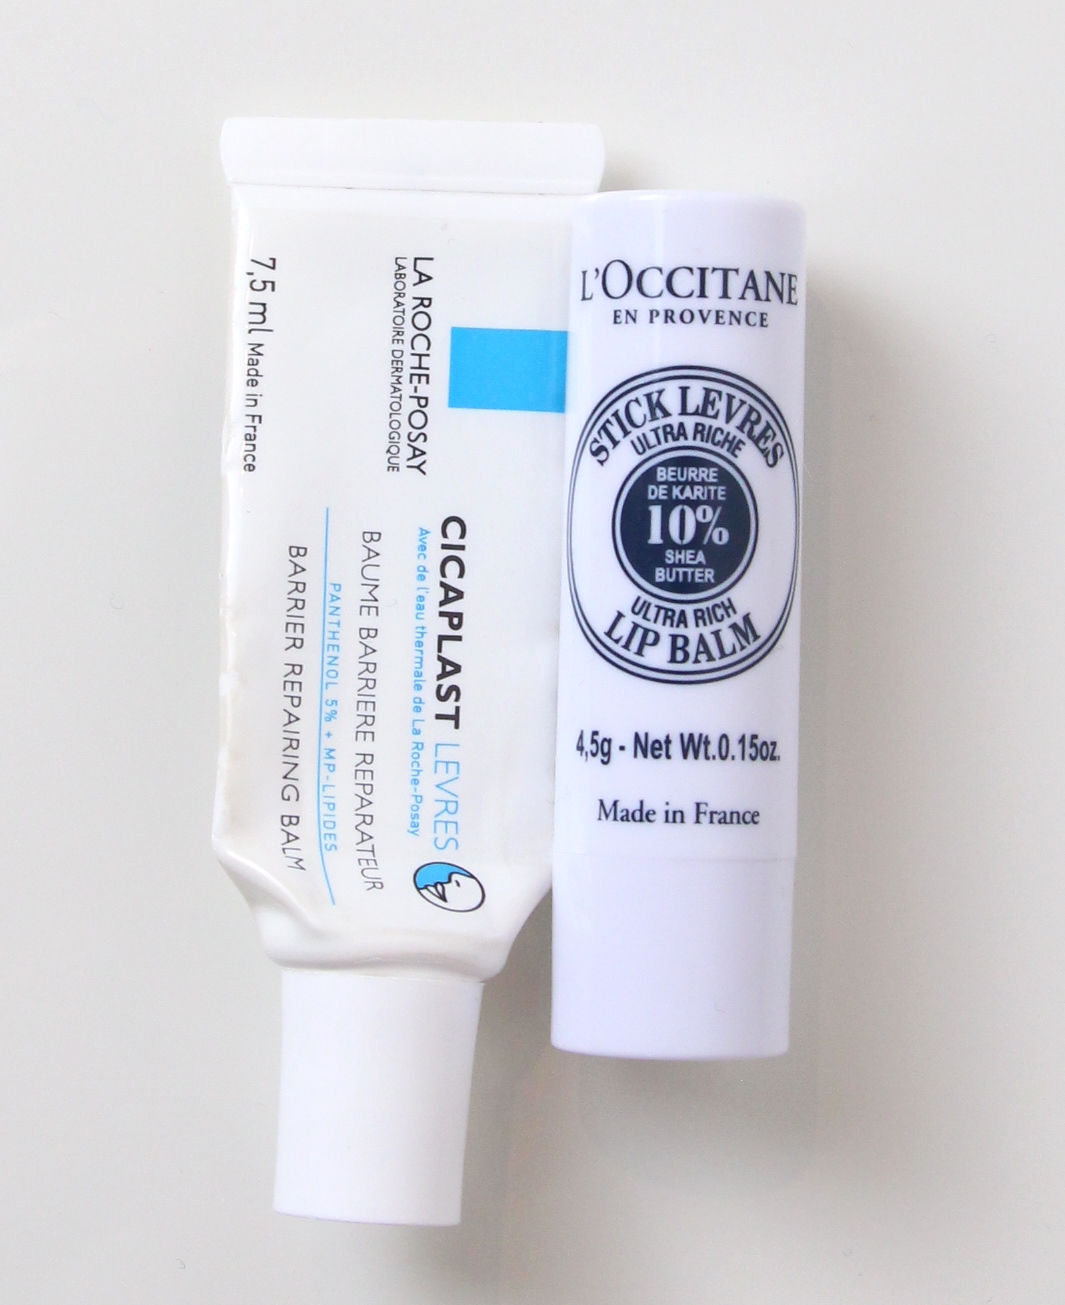 L'Occitane Natural Shea Ultra Rich Lip Balm, La Roche-Posay Cicaplast Levres Barrier Repairing Balm